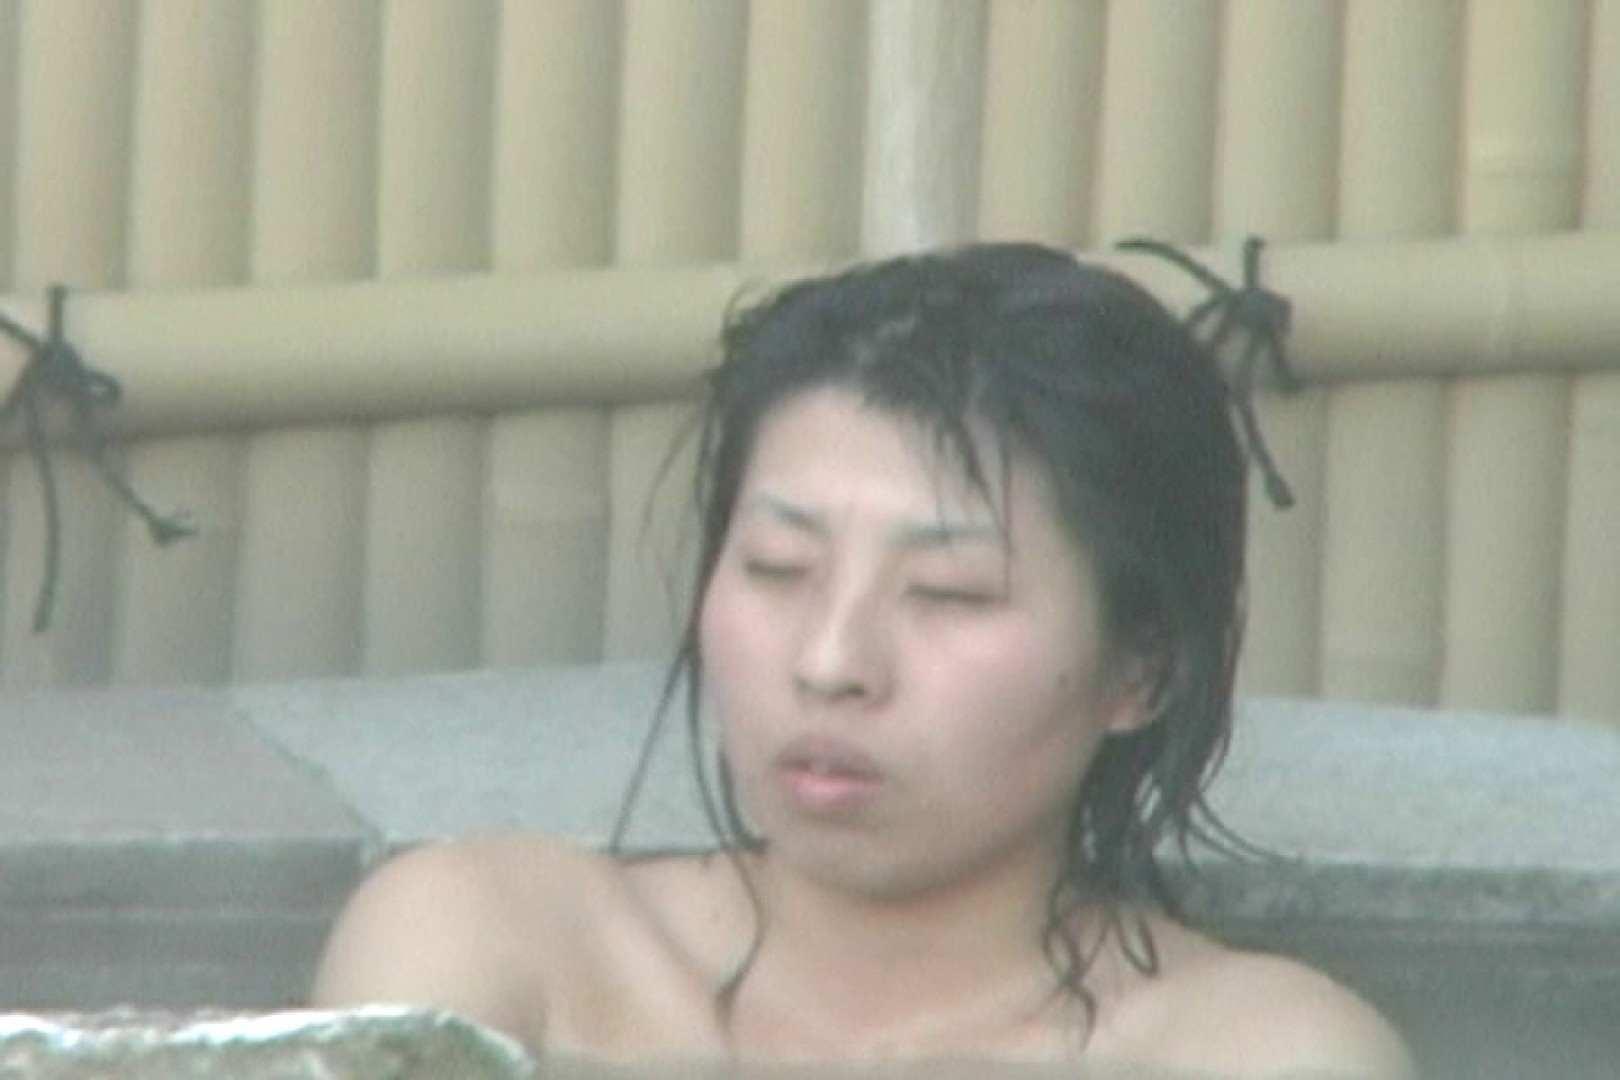 Aquaな露天風呂Vol.589 盗撮 | HなOL  105pic 37